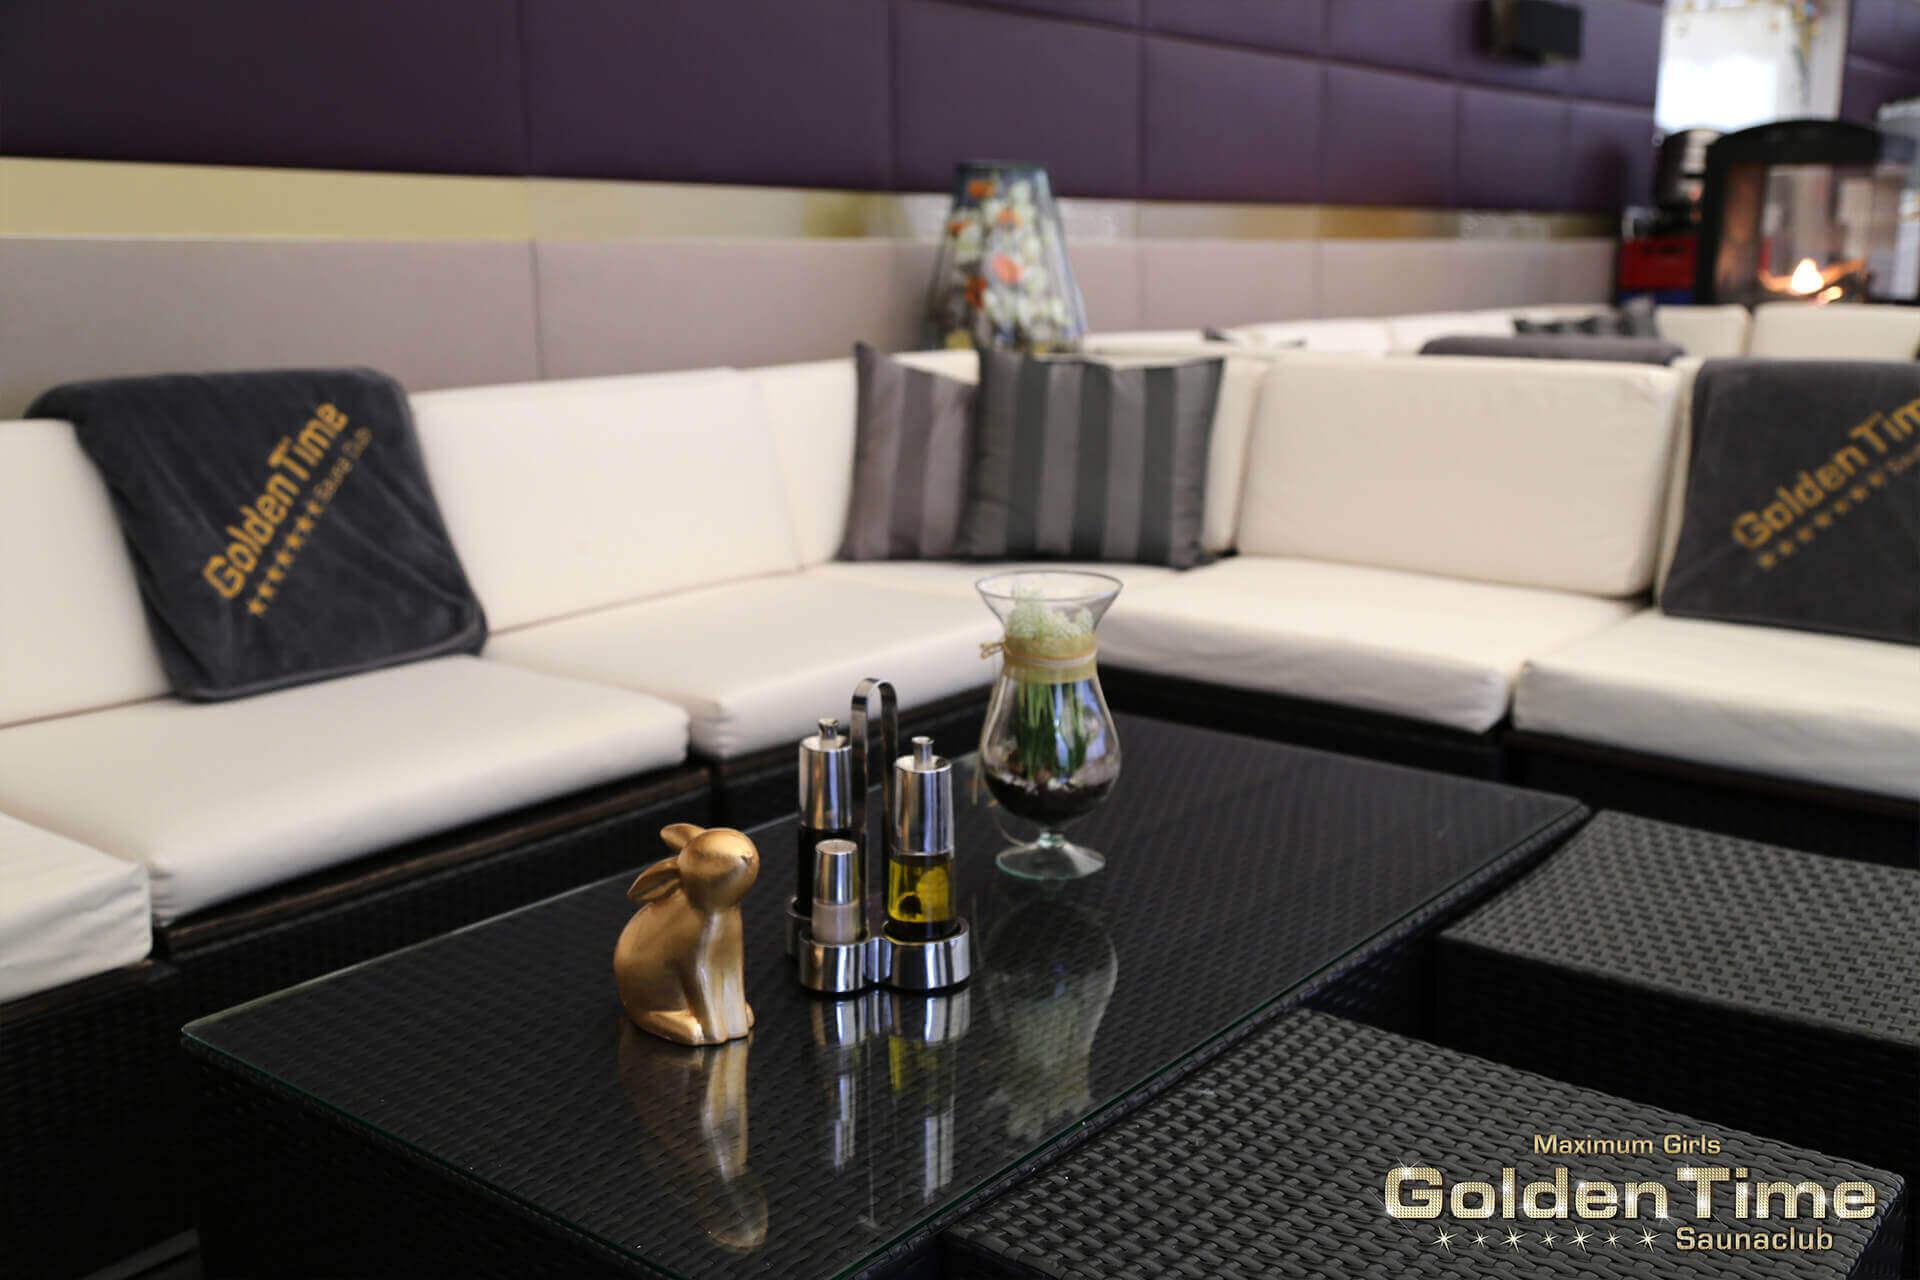 02-ostern-2016-pic-27-goldentime-saunaclub.jpg